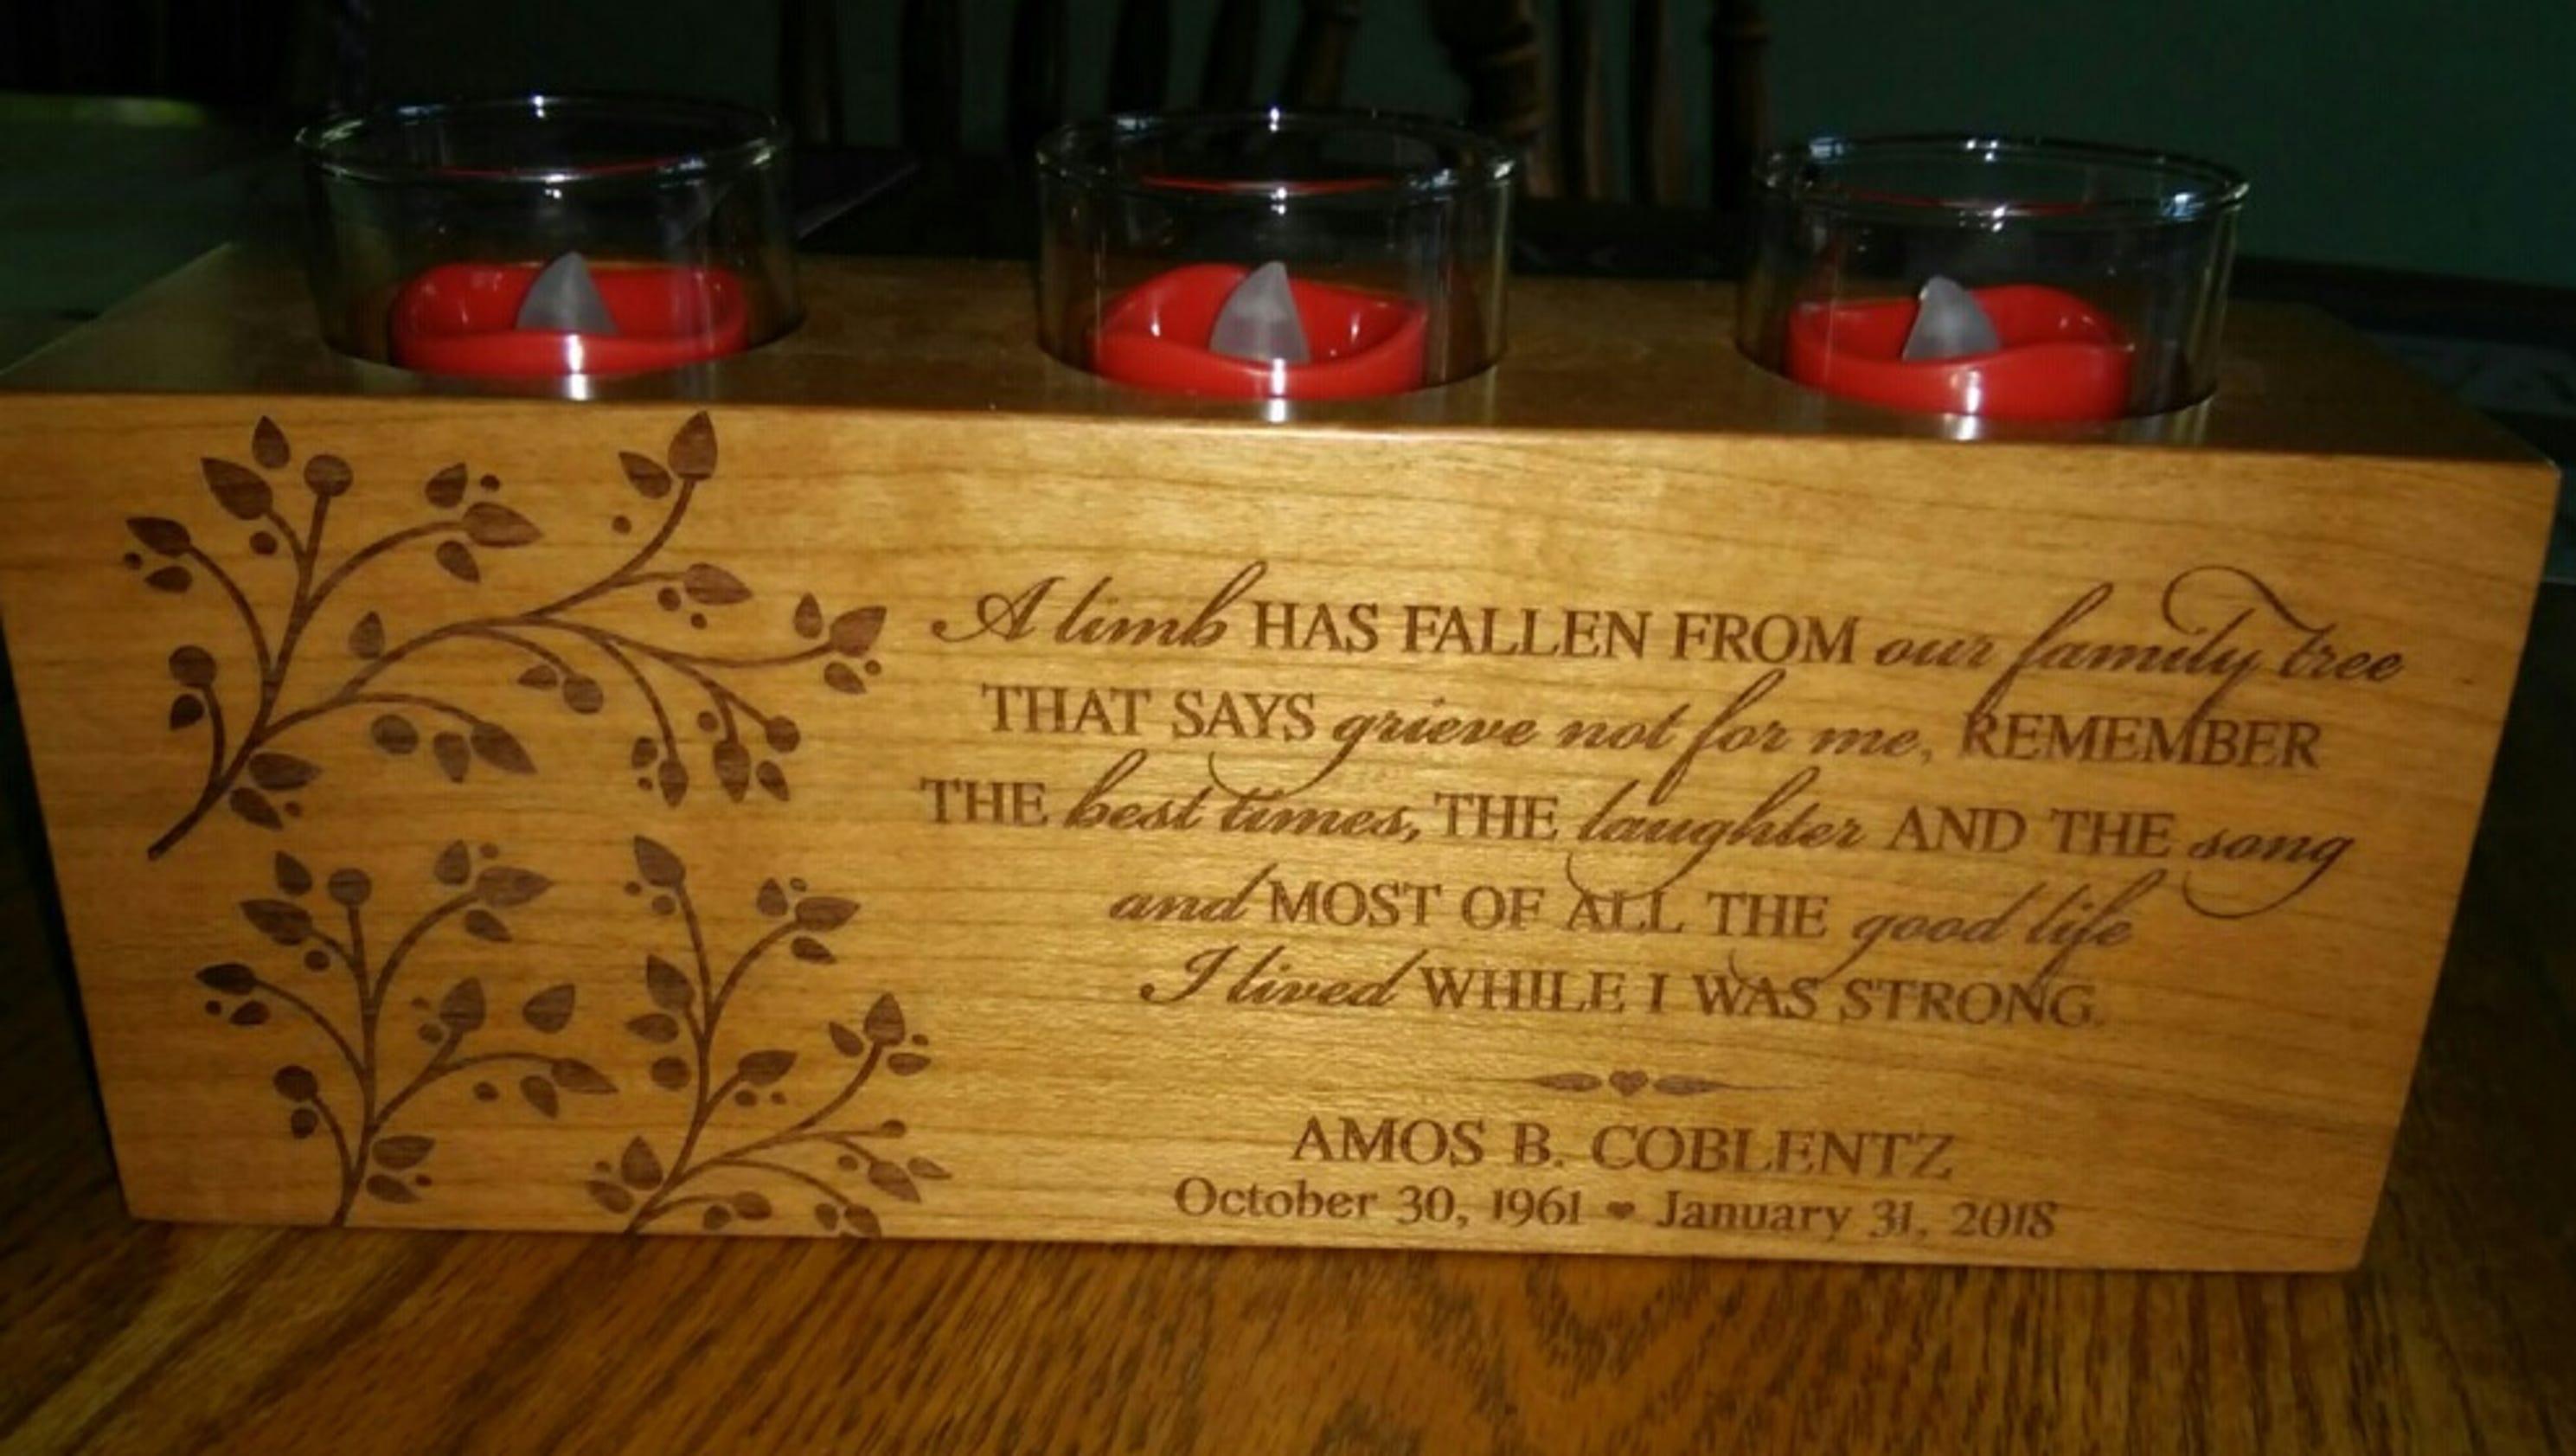 Lovina S Amish Kitchen Facebook